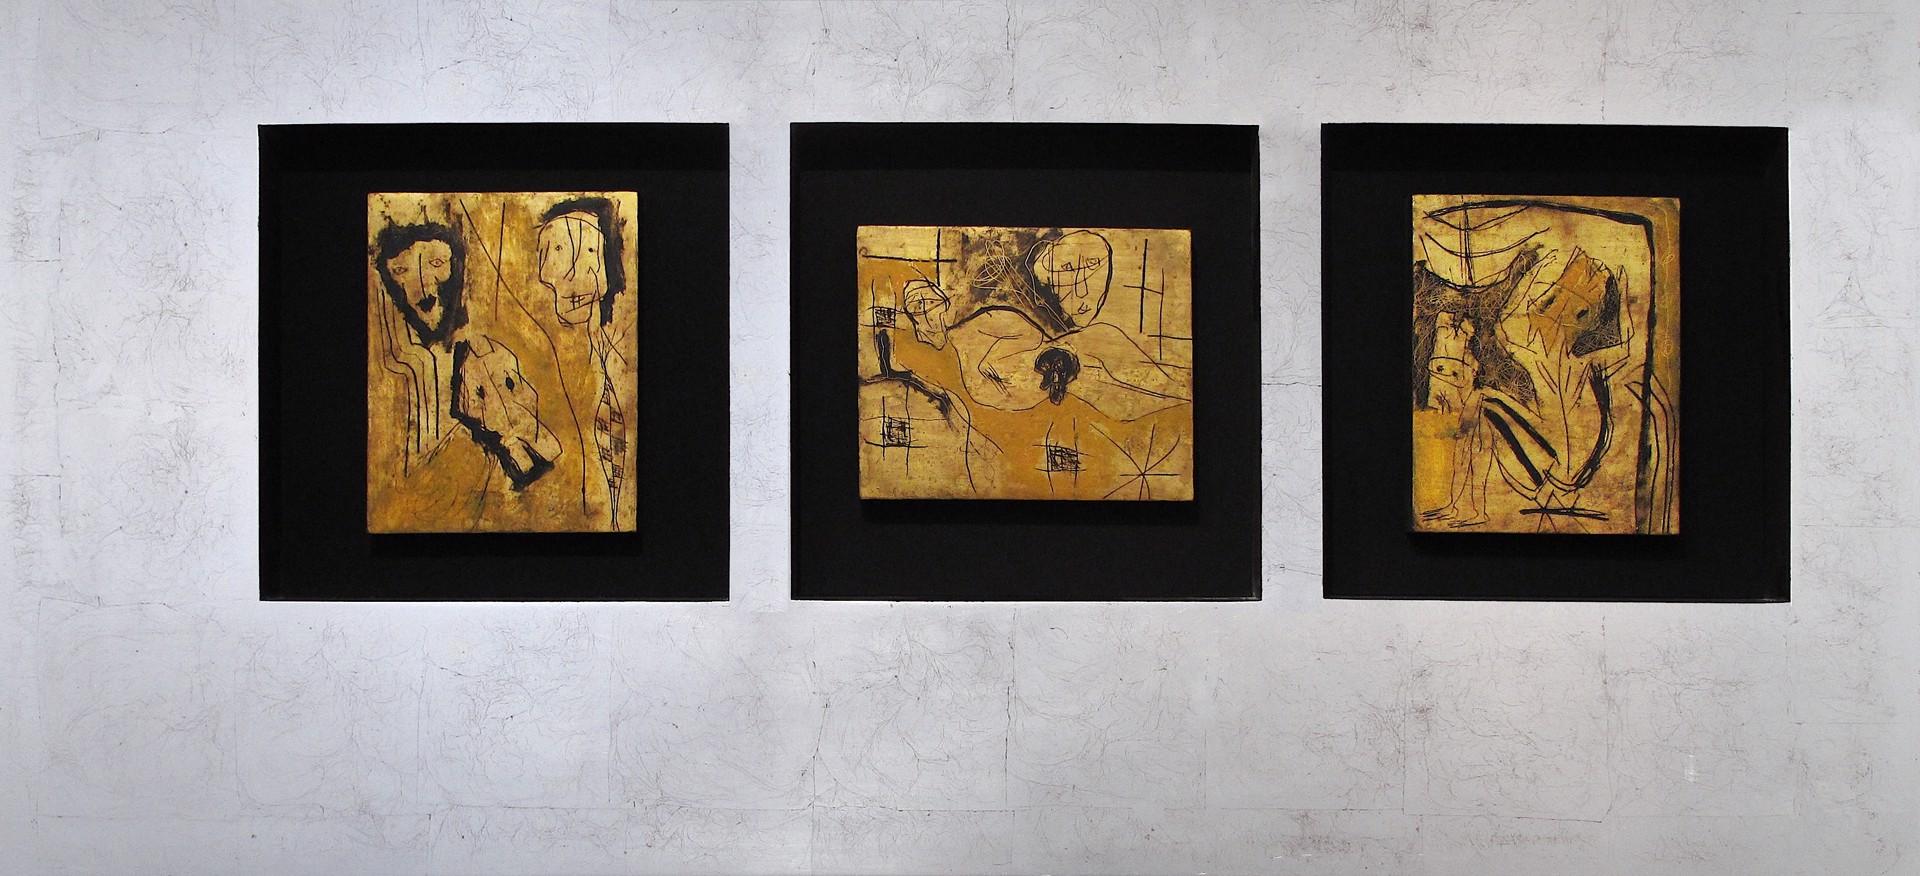 Untitled Triptych by Alejandro Santiago